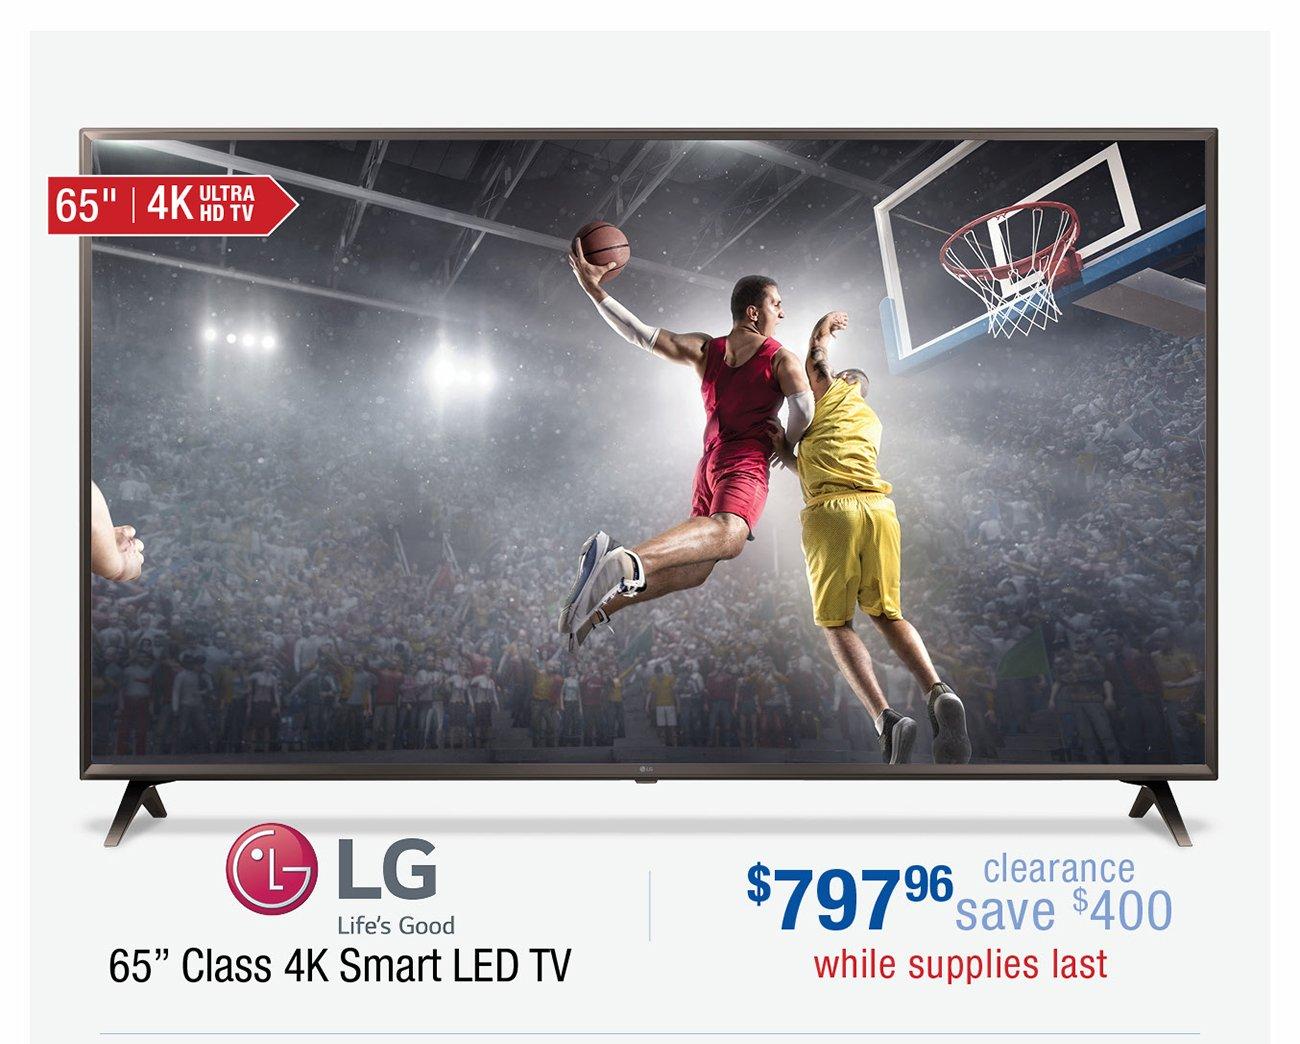 Lg-65-inch-4k-tv